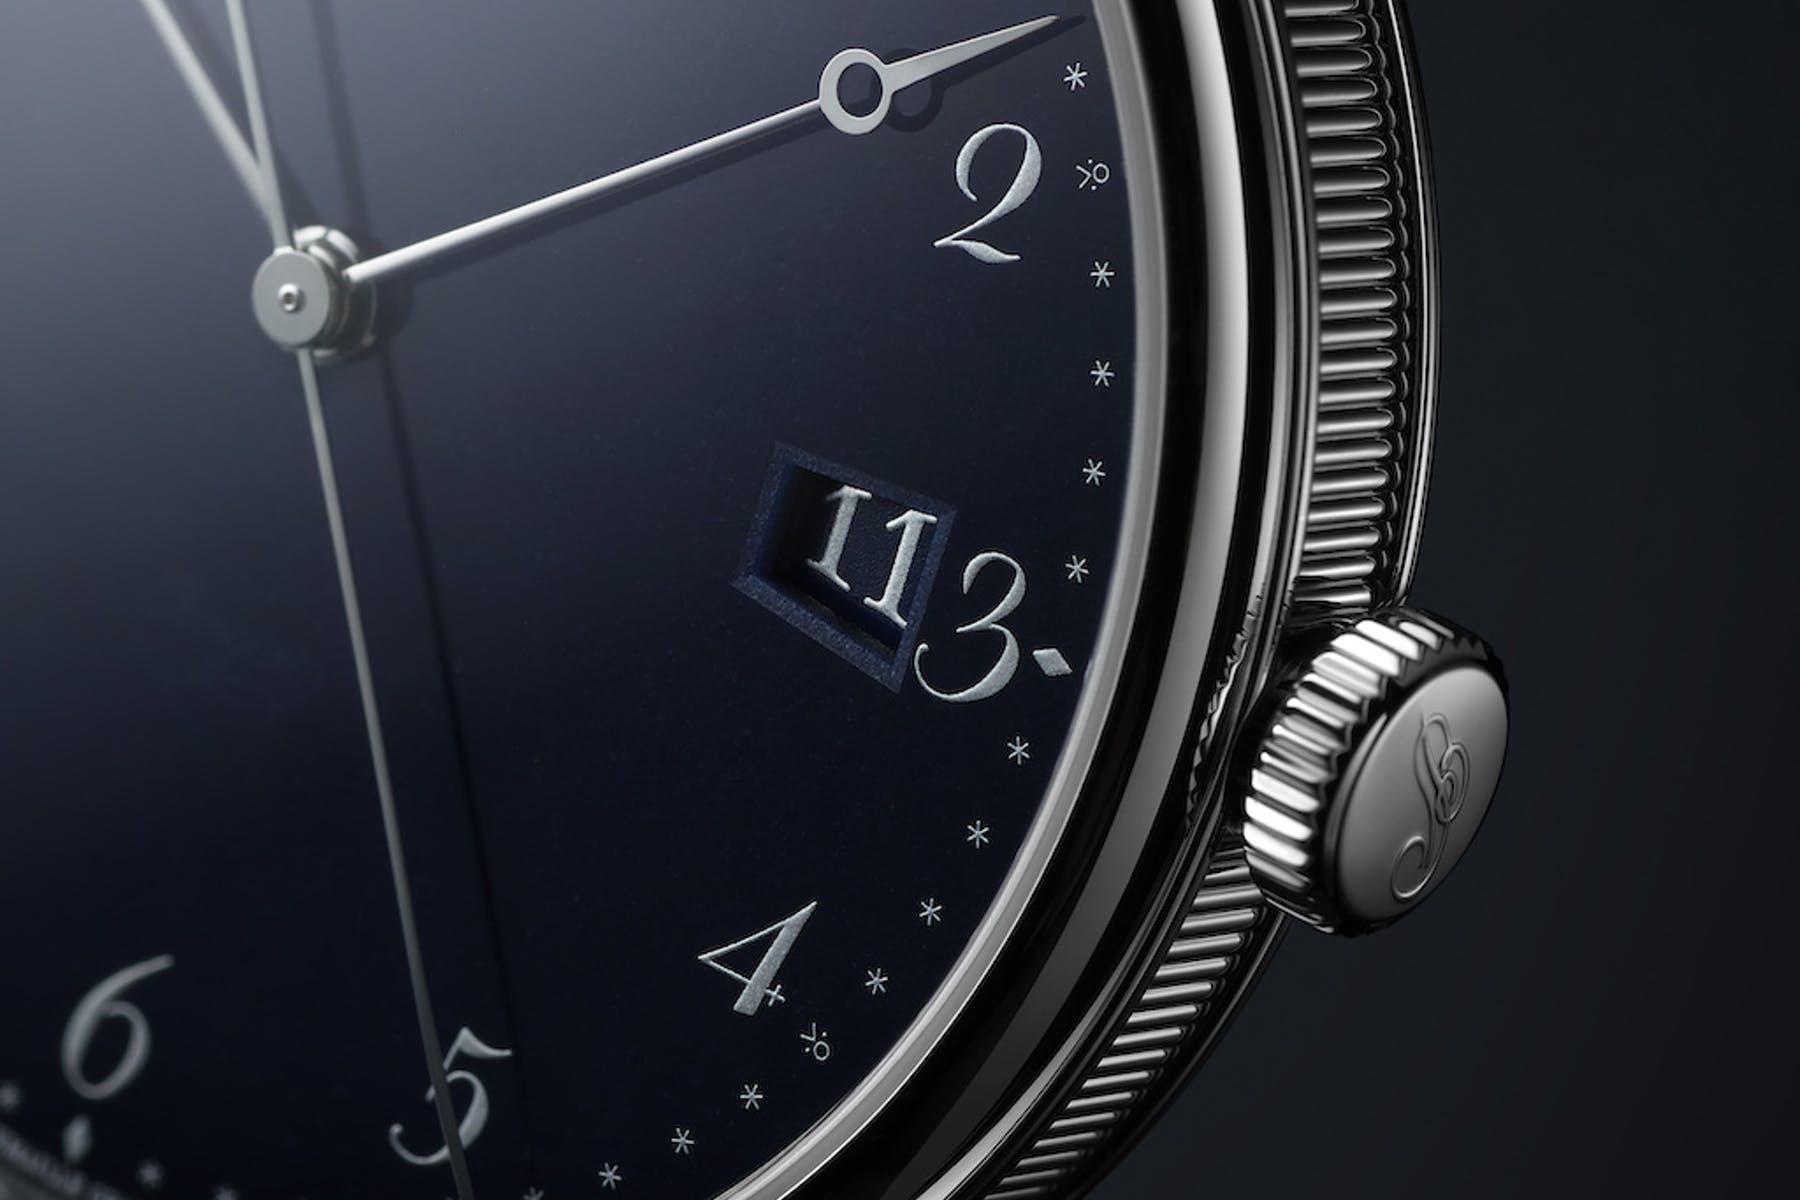 Why the Breguet Classique 5177 deserves a much closer look